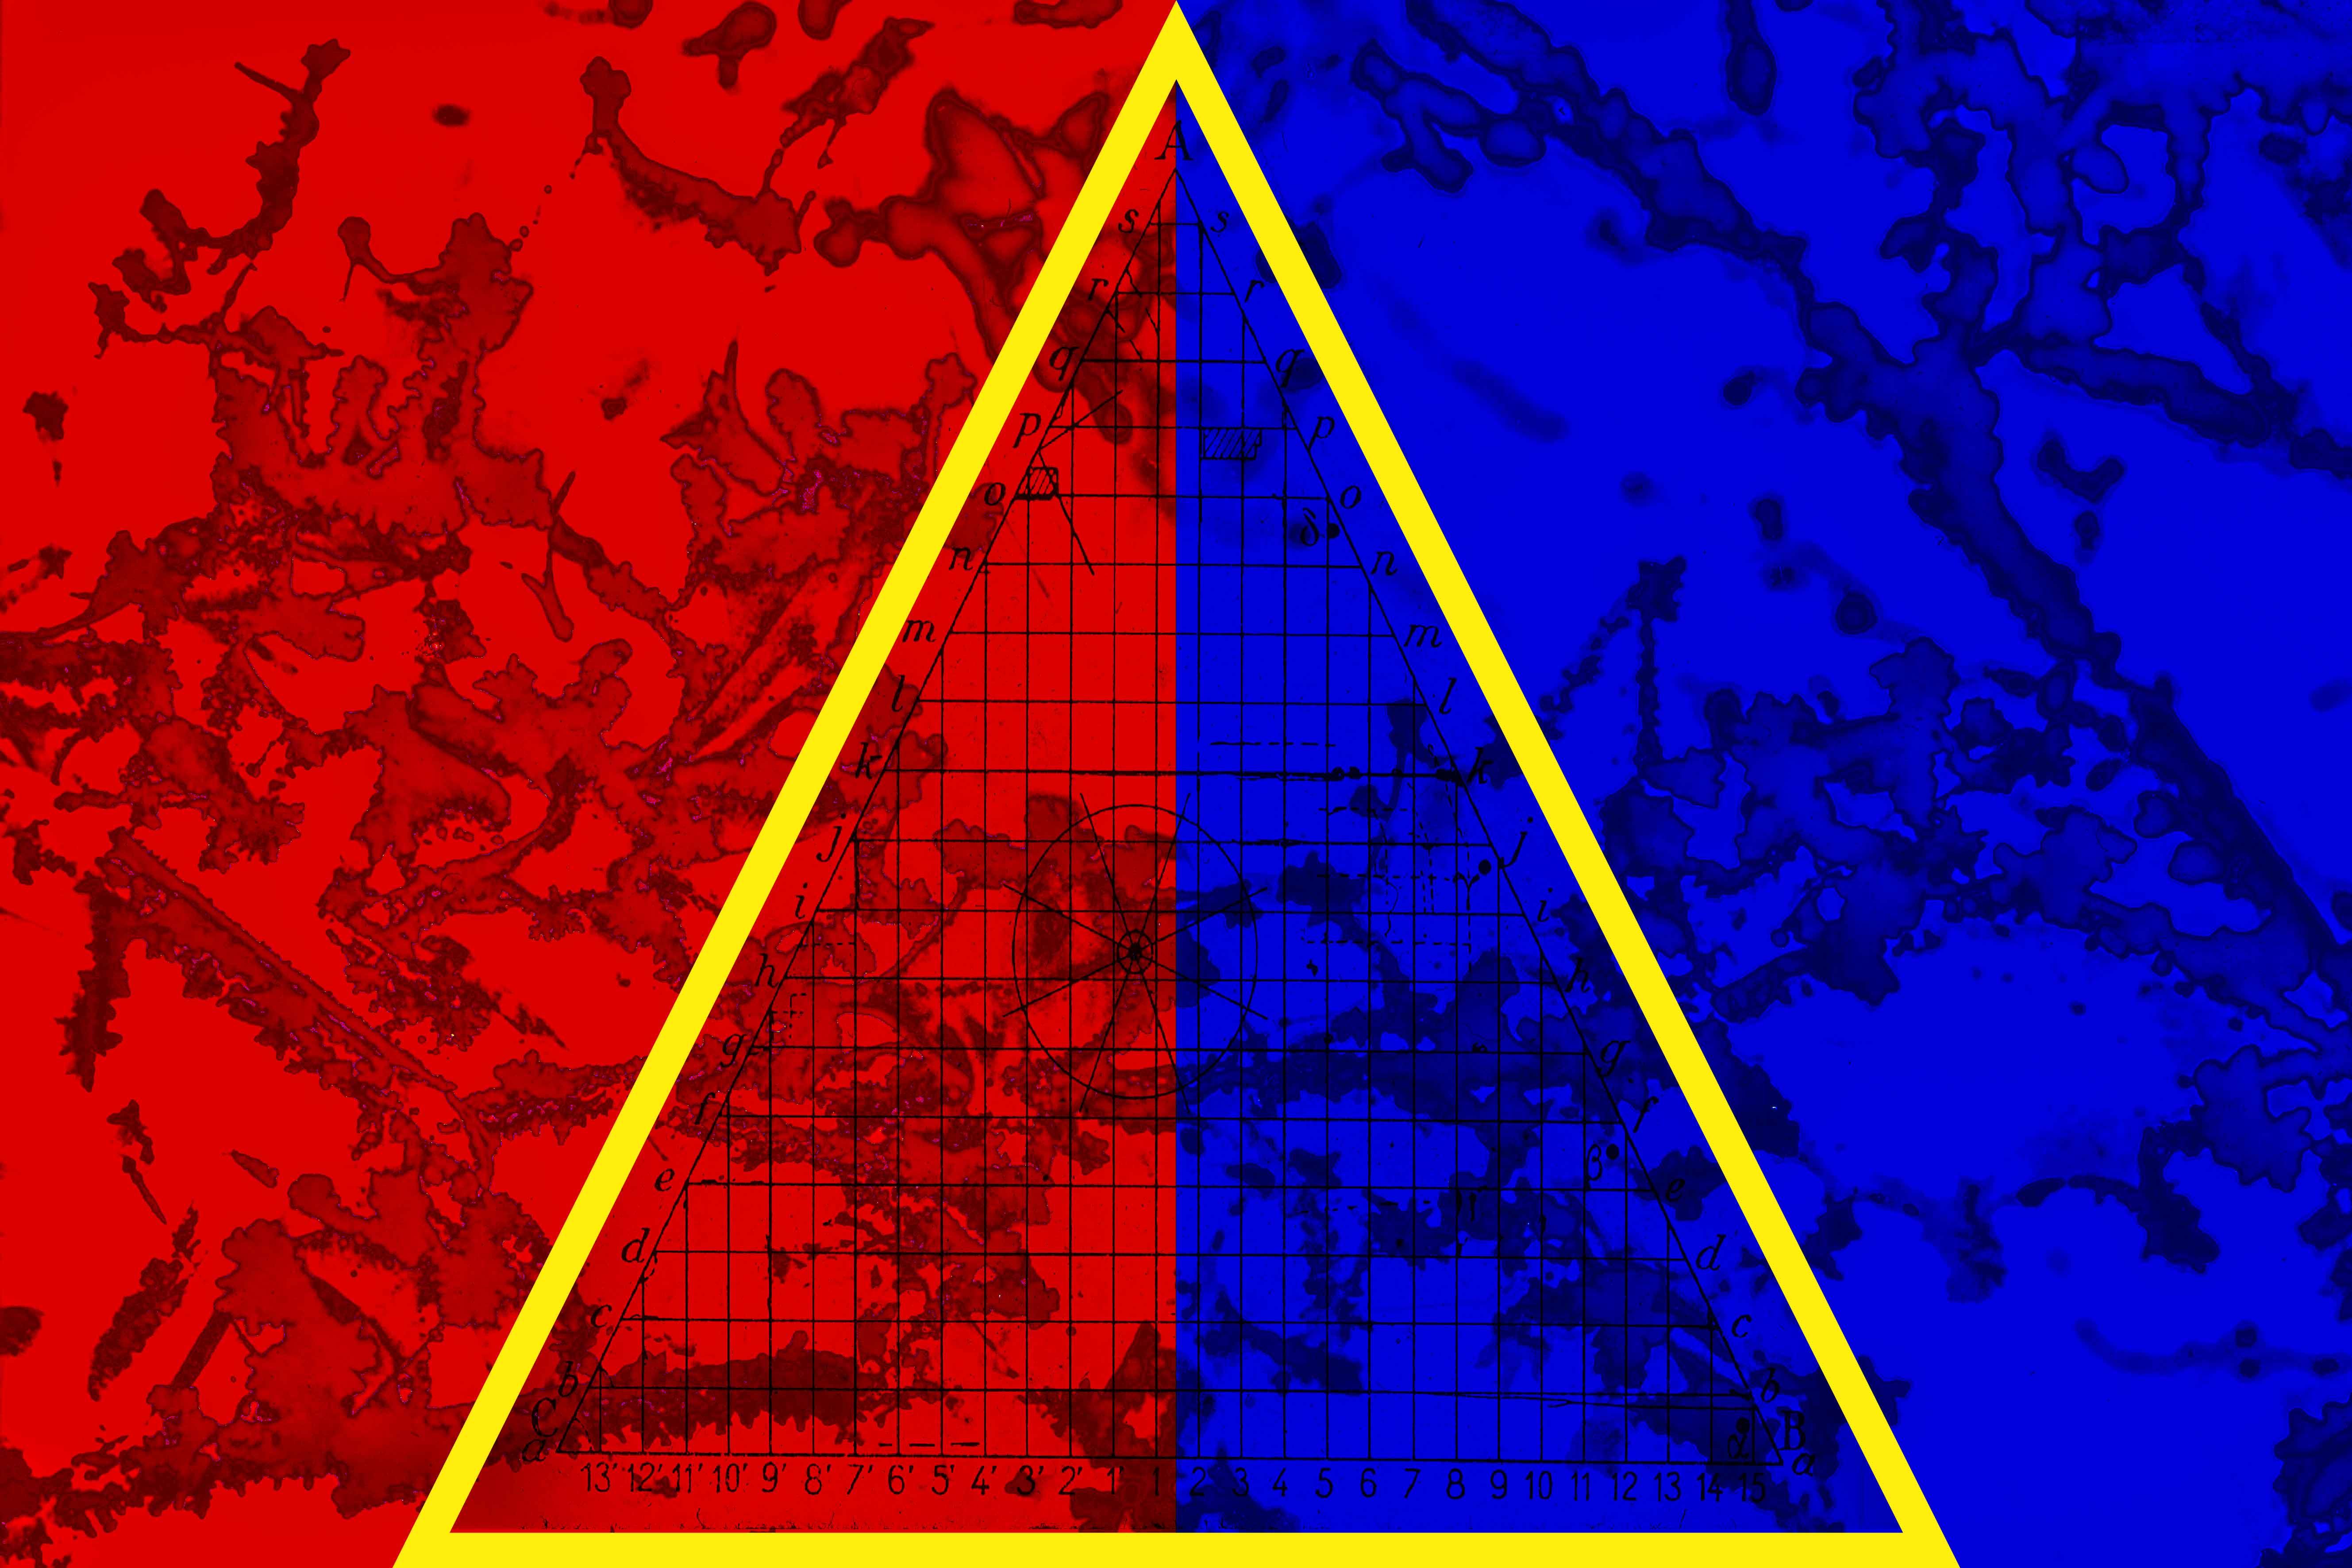 Line Segments - Yellow-triangle